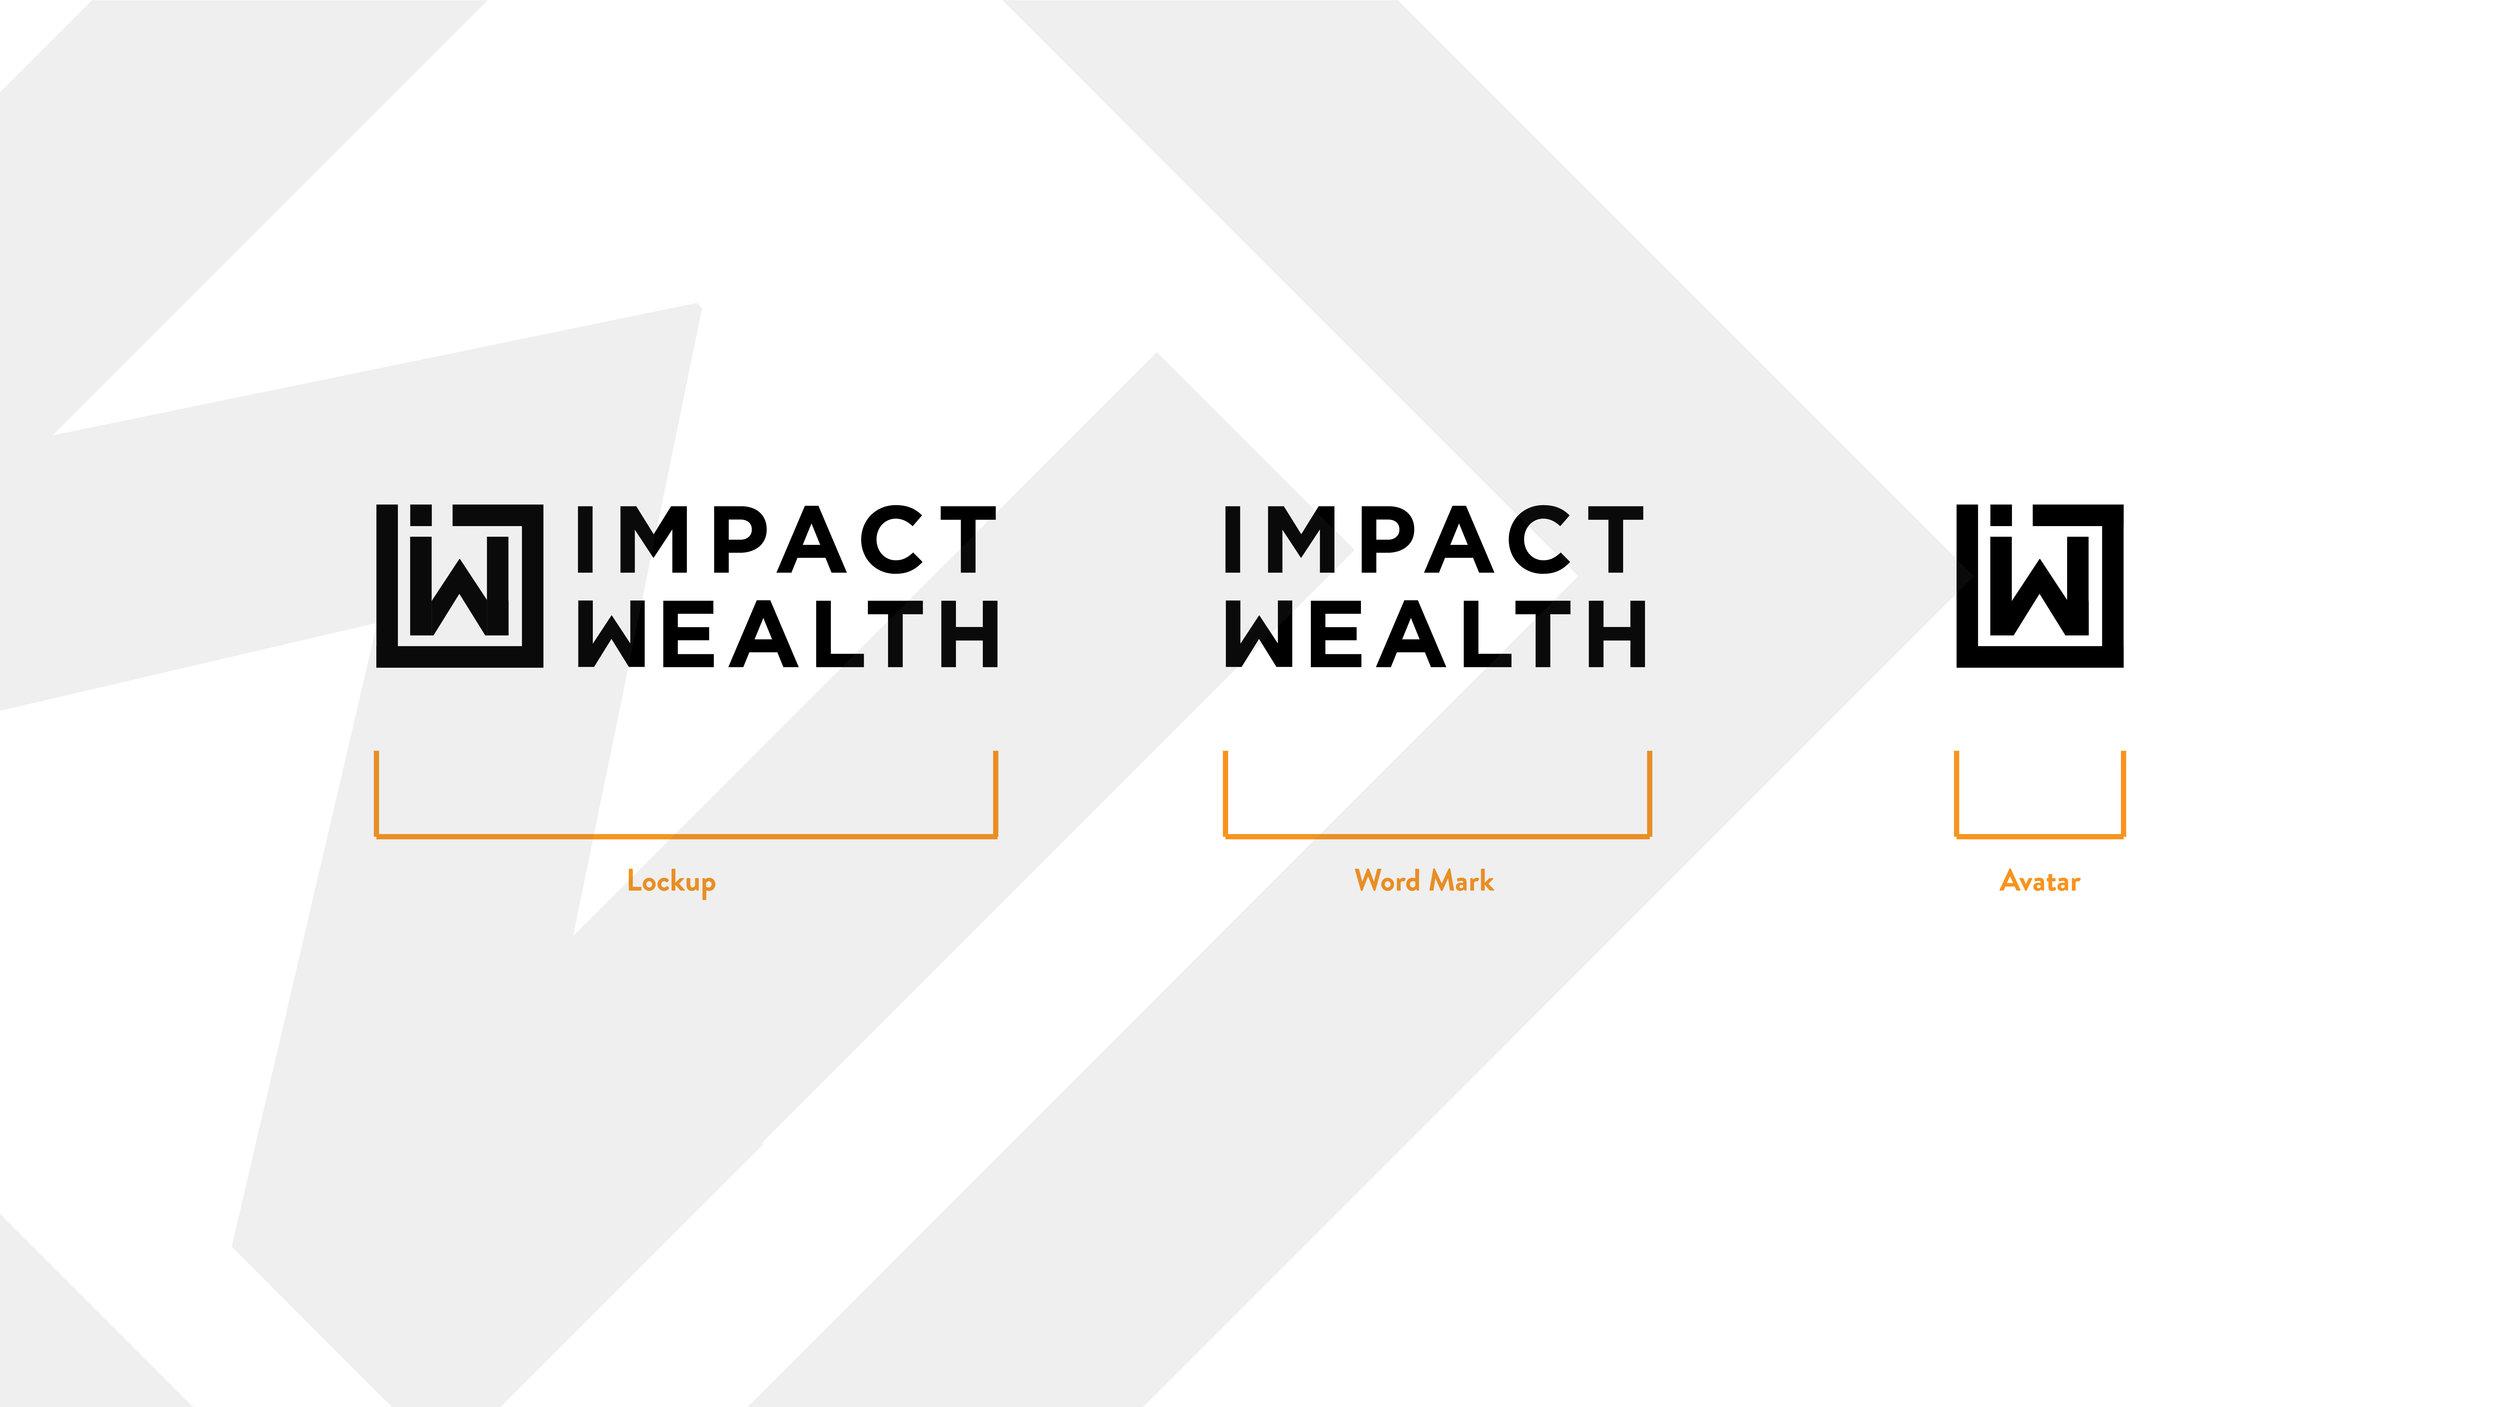 Impact Welath Porfolio Outline [Recovered]-05.jpg